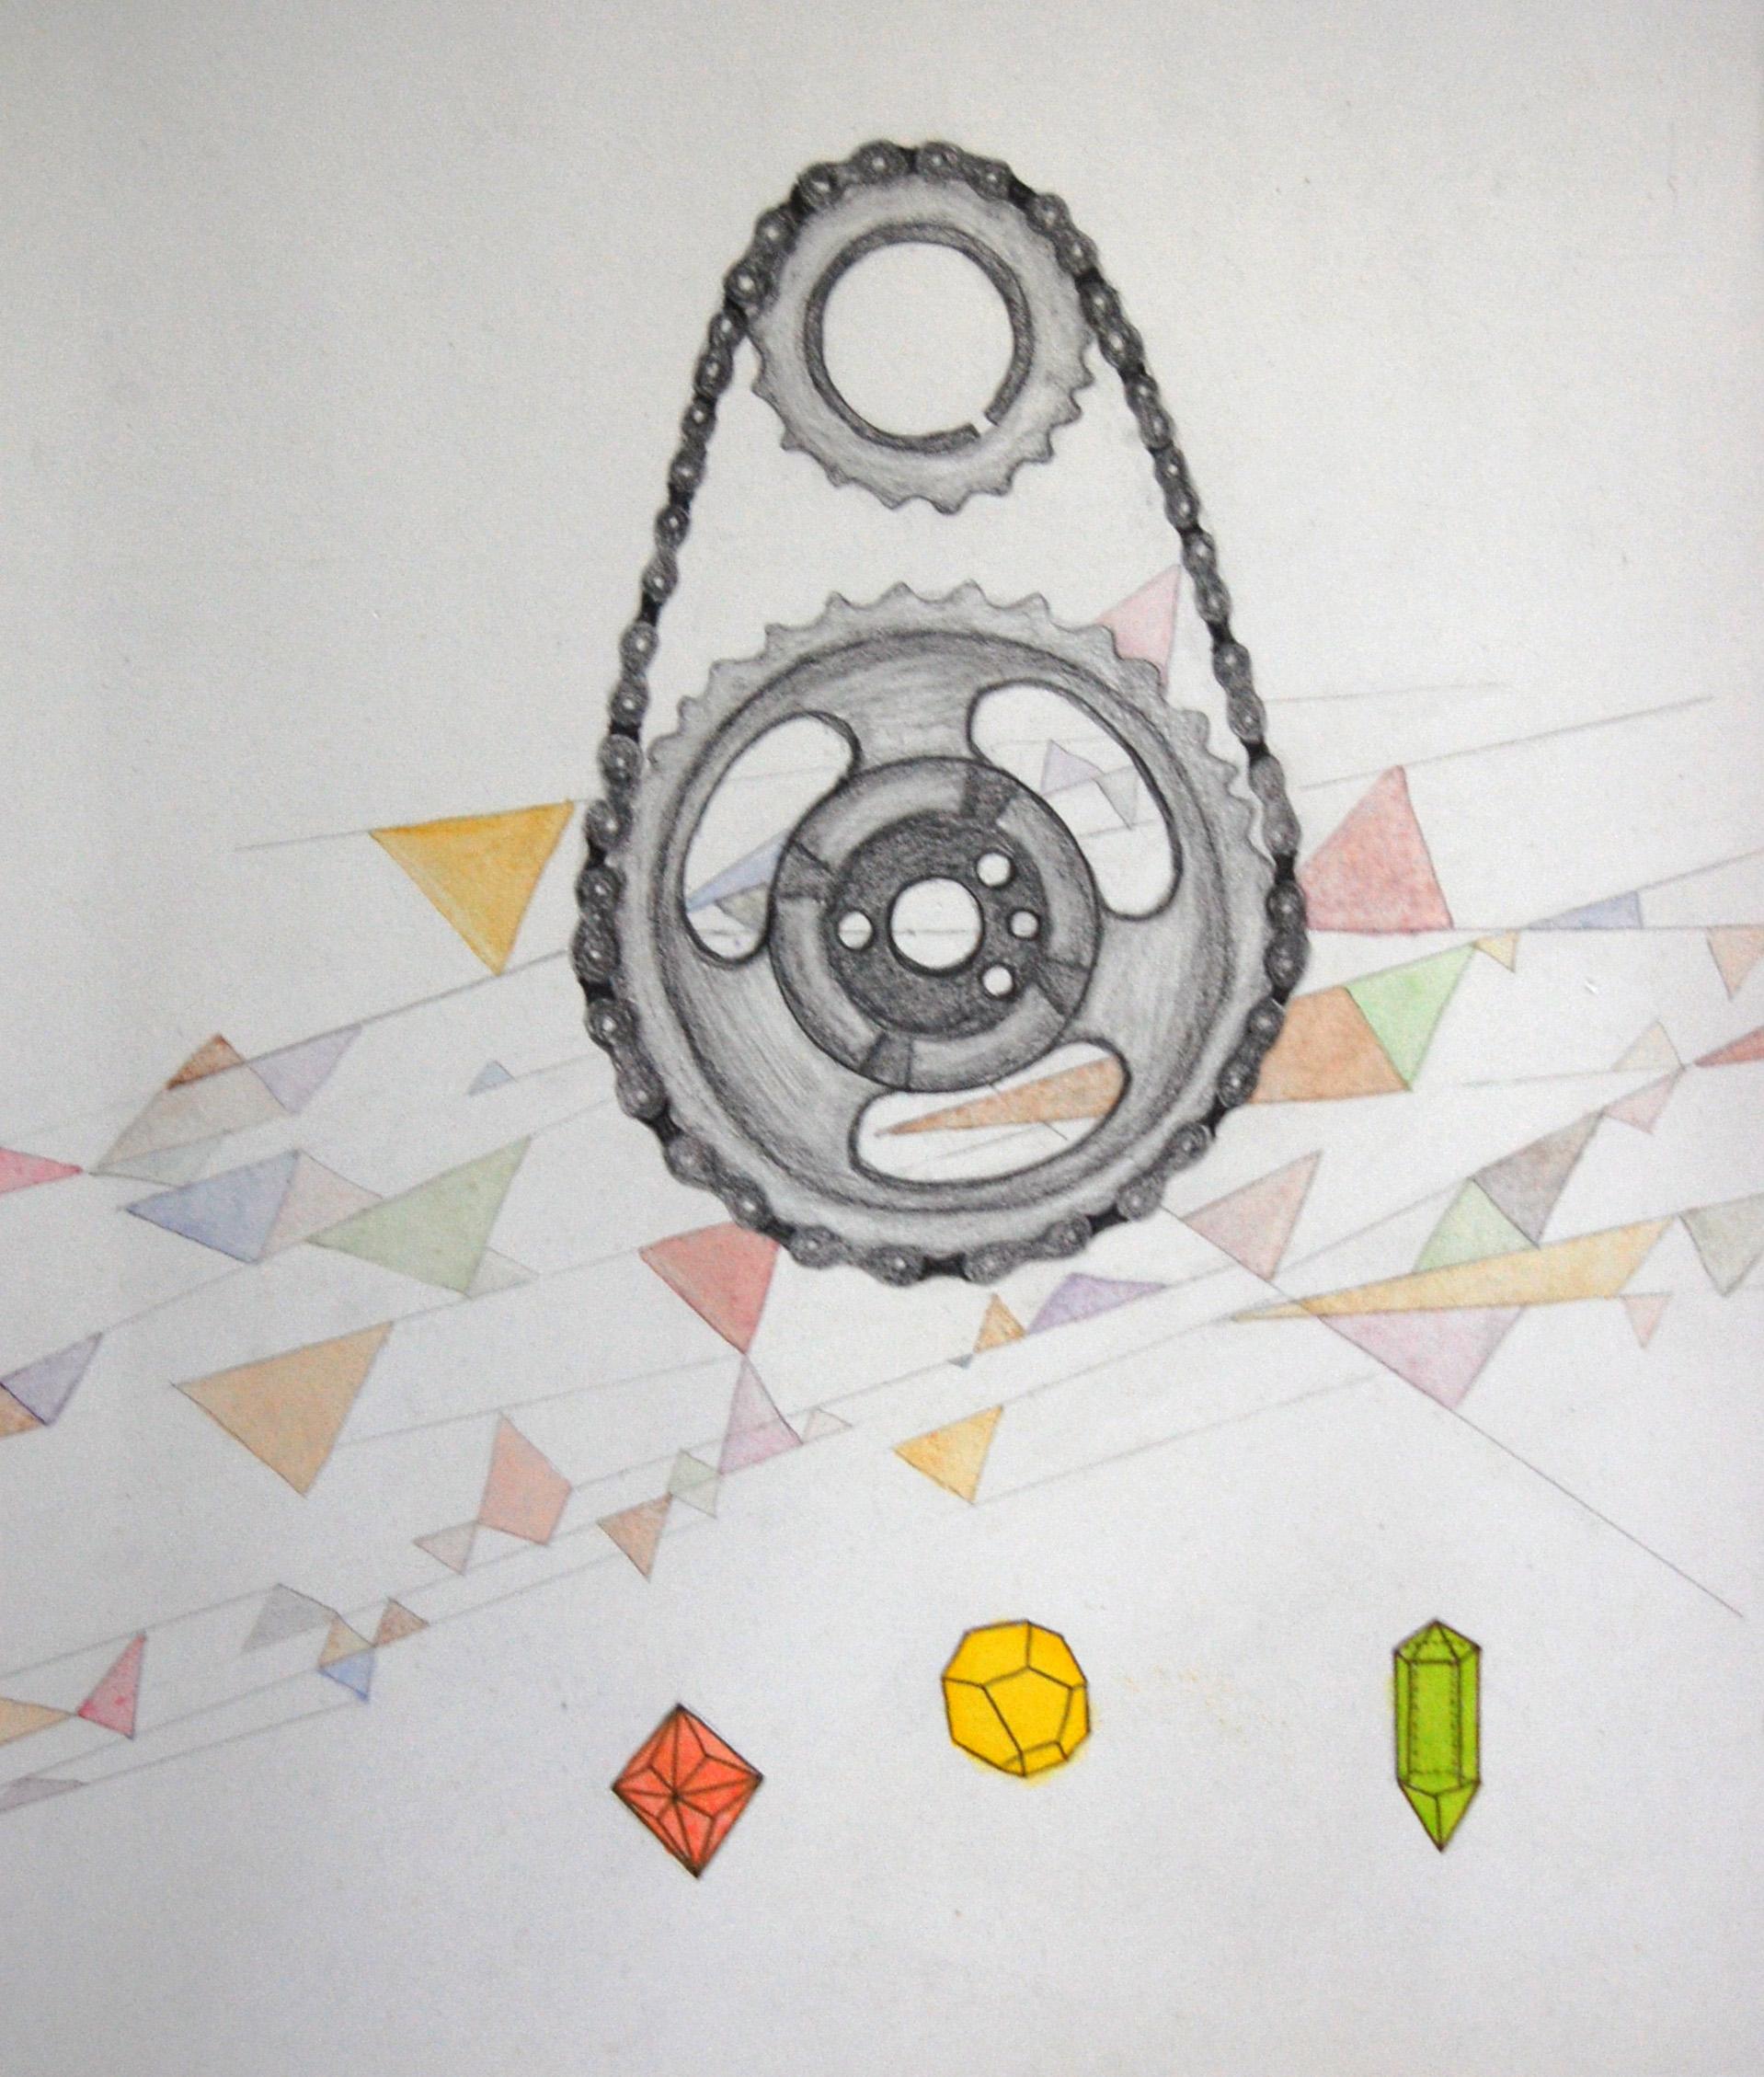 crystal gear_0.jpg